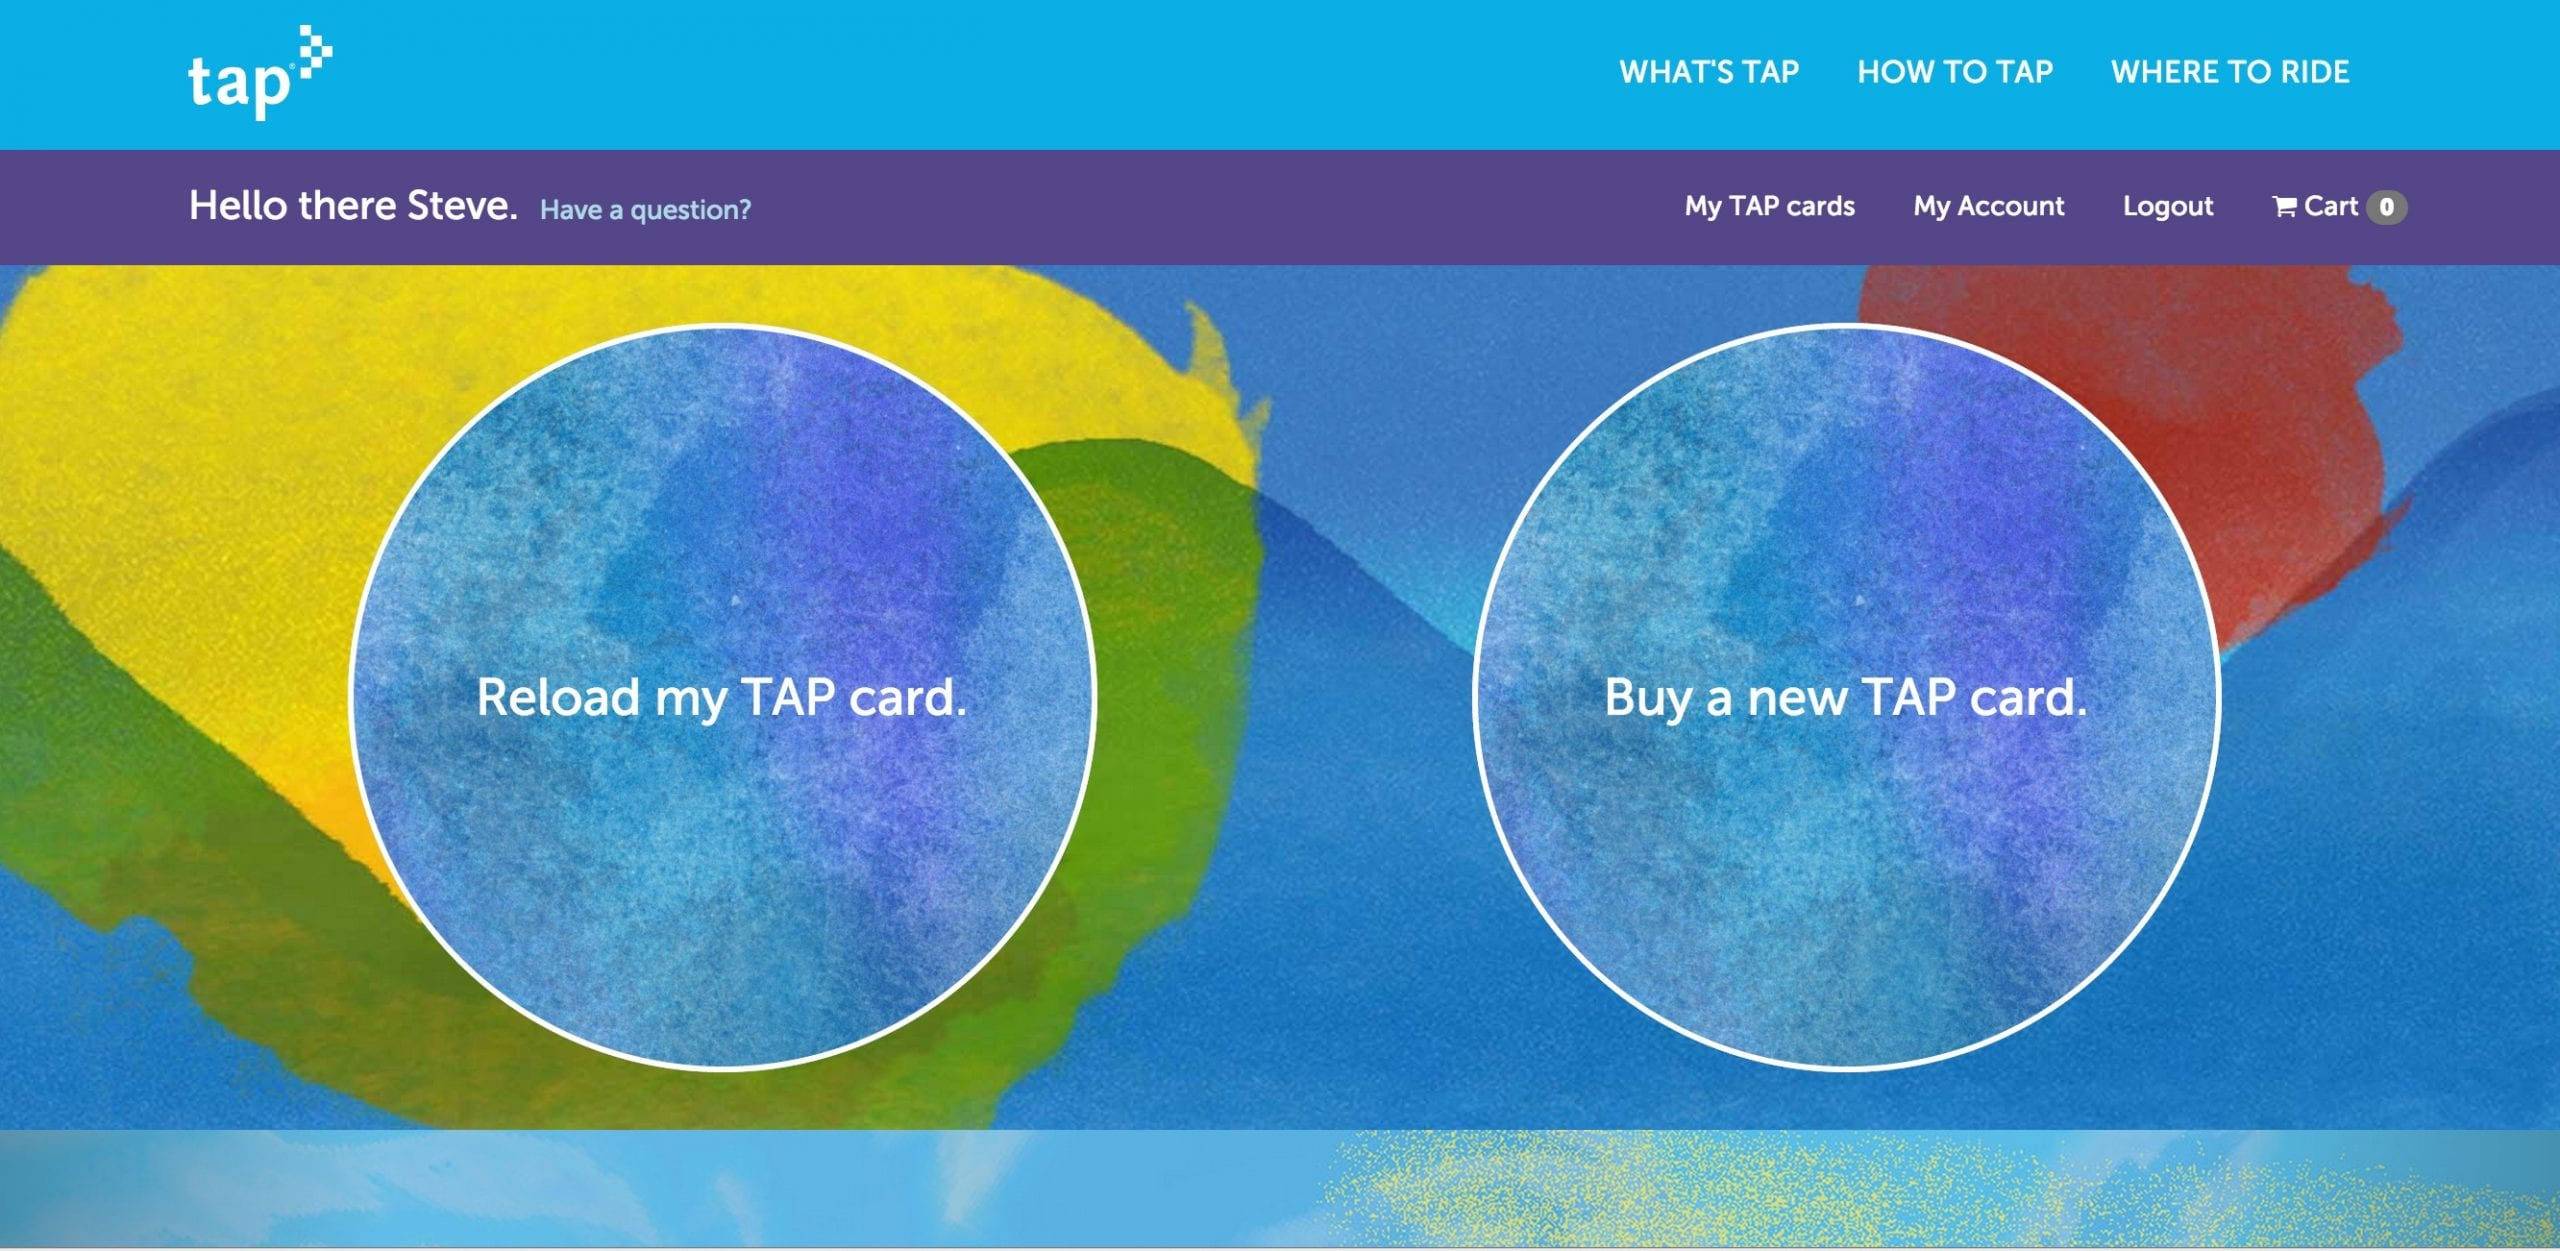 tapwebsite